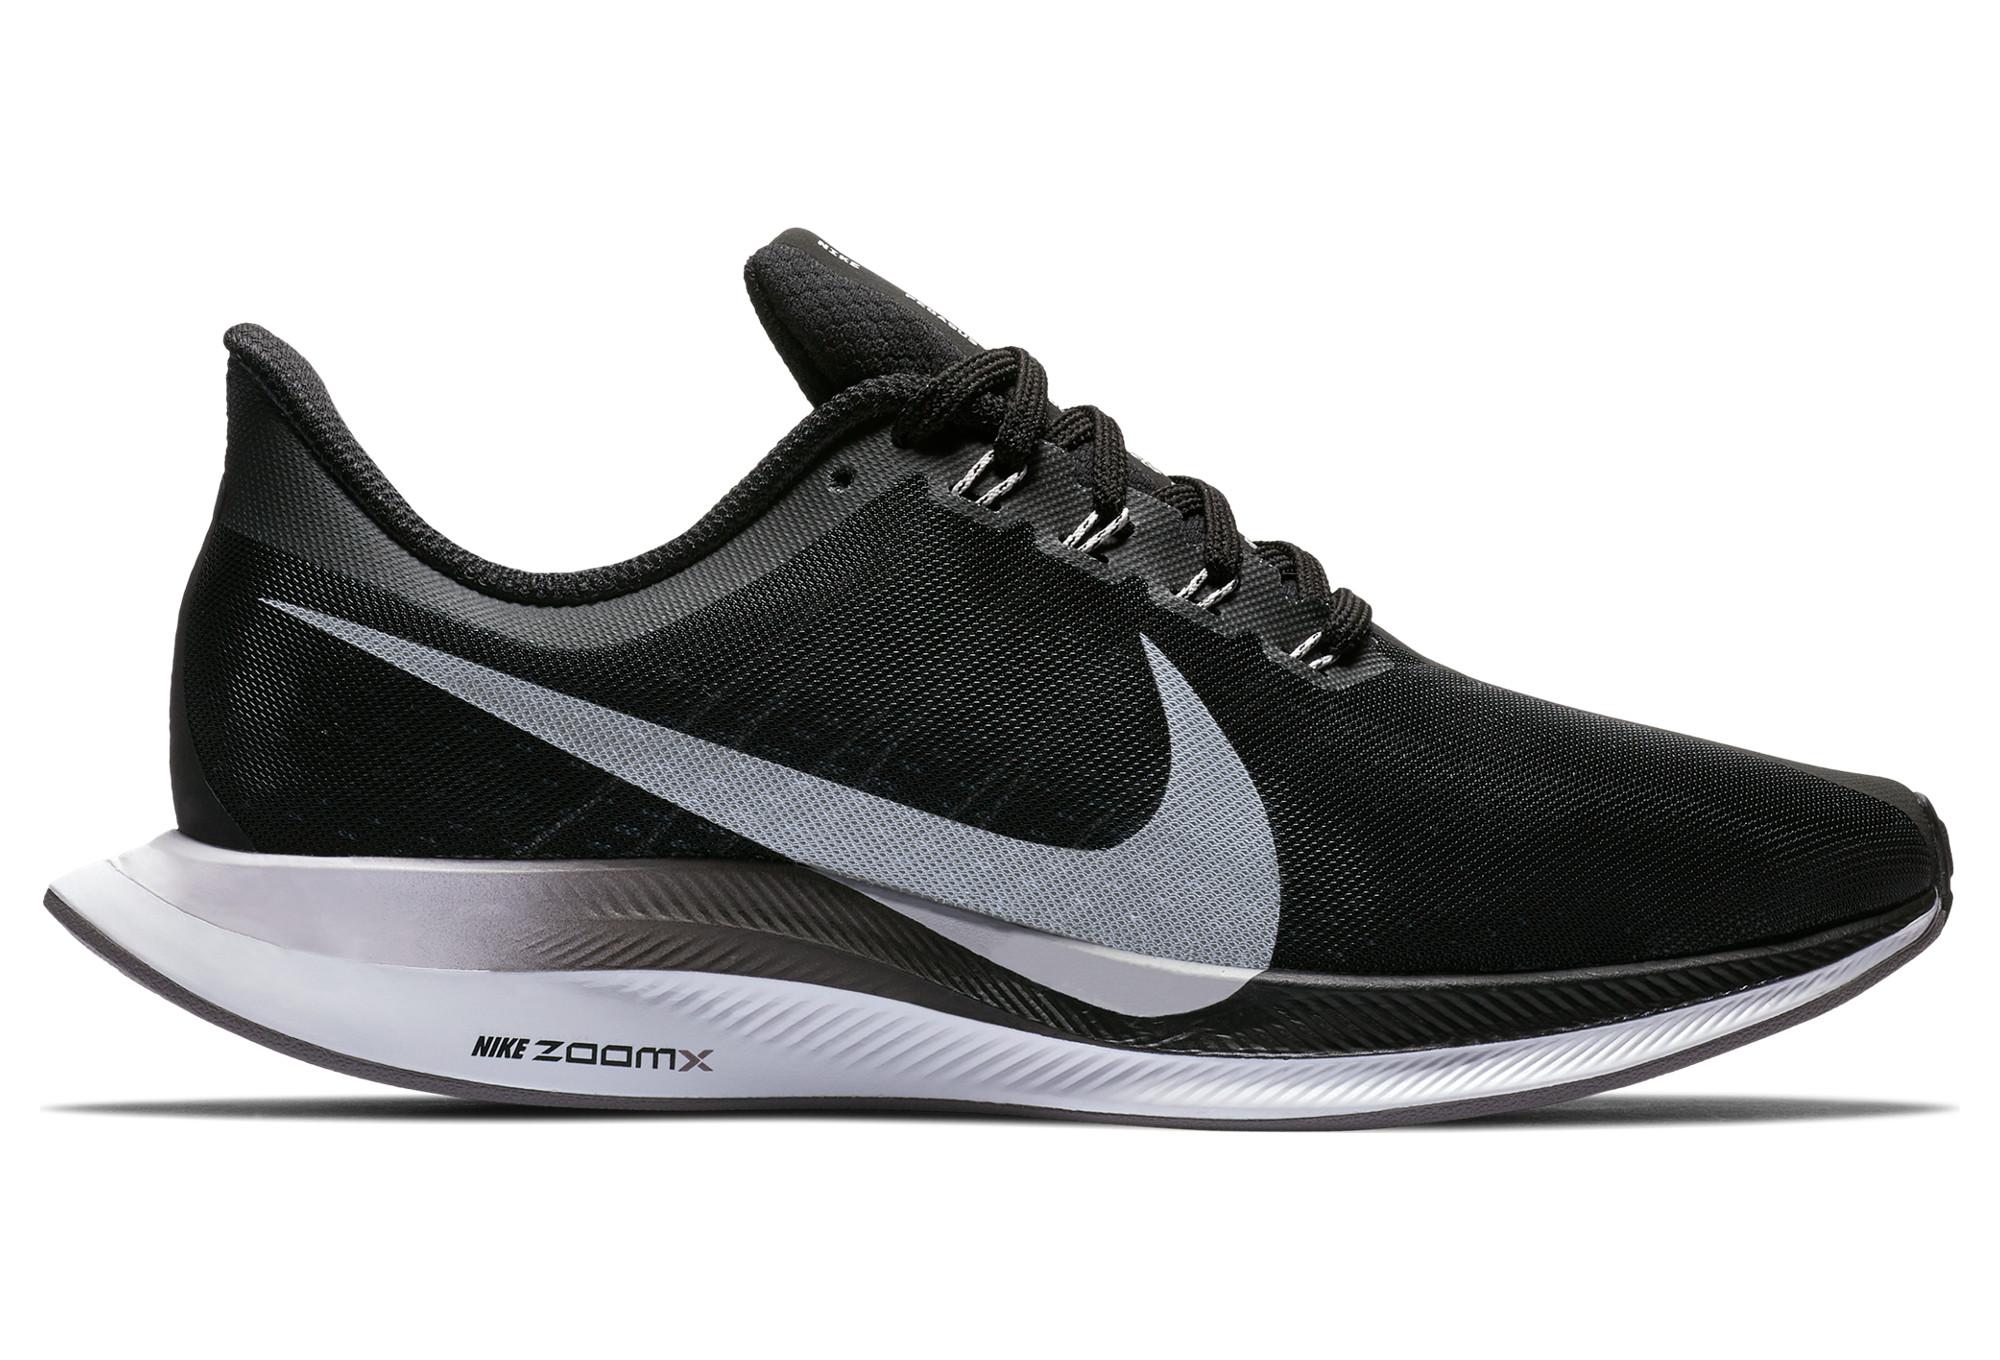 Chaussures Chaussures Chaussures De Running Femme Nike Zoom Pegasus Turbo Blanc   Noir fdcee2